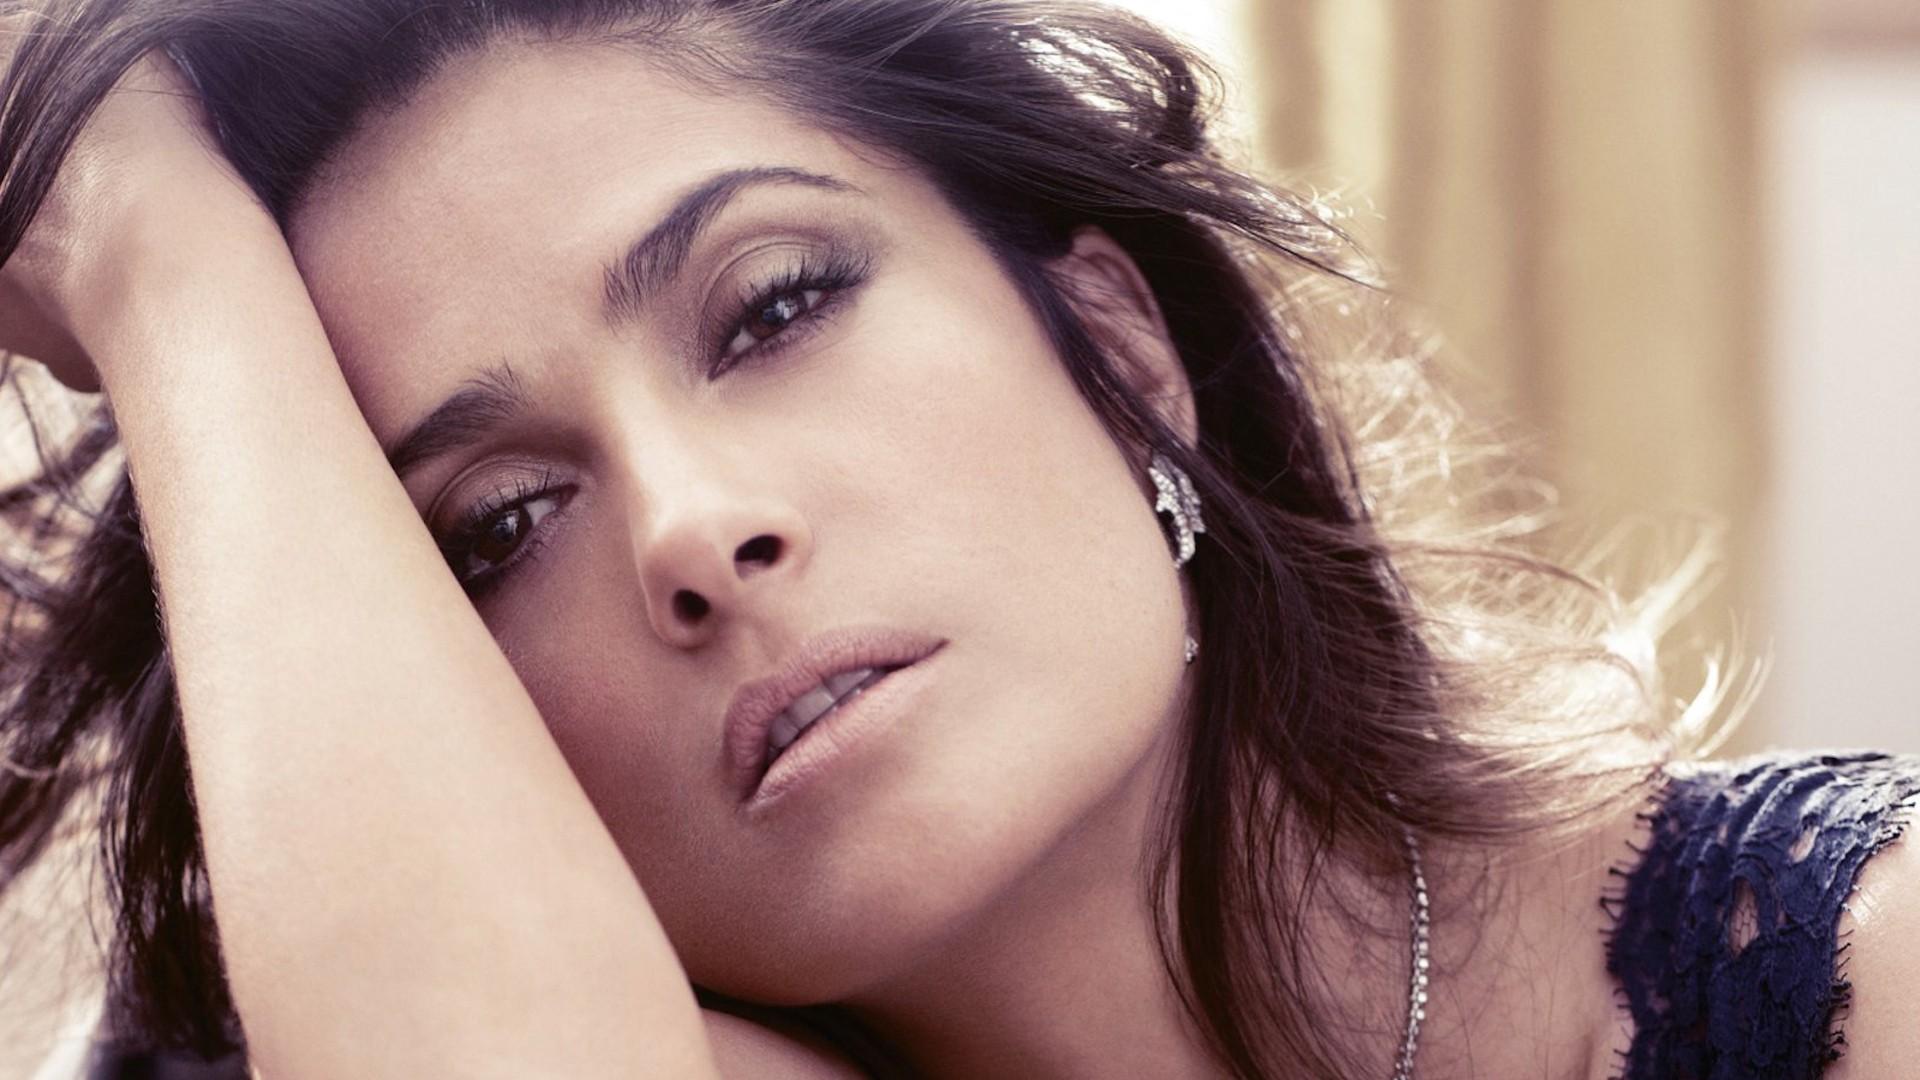 salma hayek celebrity desktop wallpaper 52009